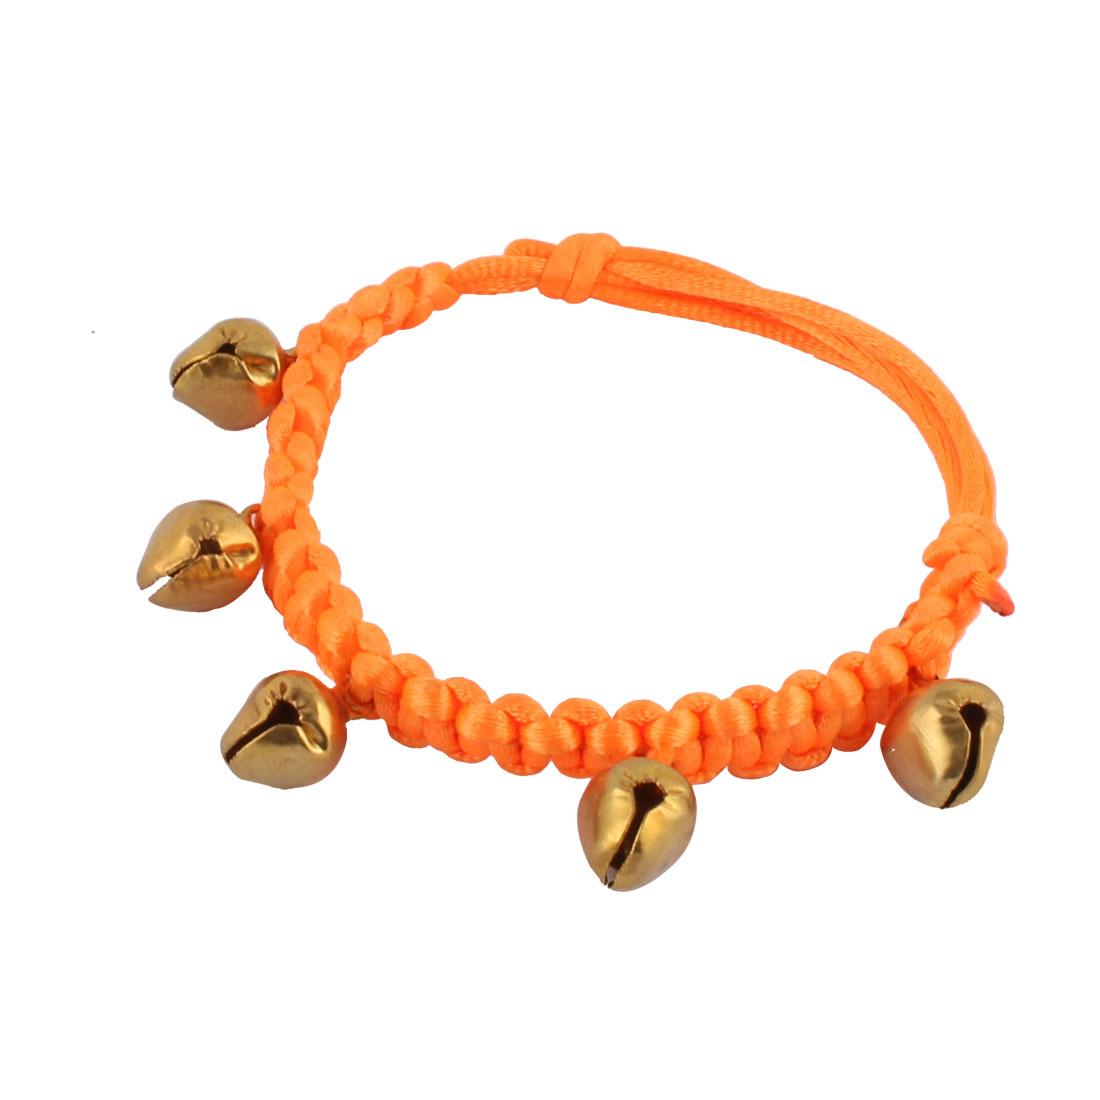 Pet Dog Nylon Braided Rope Strap Bell Pendant Decor Adjustable Belt Handmade Necklace Collar Bracelet